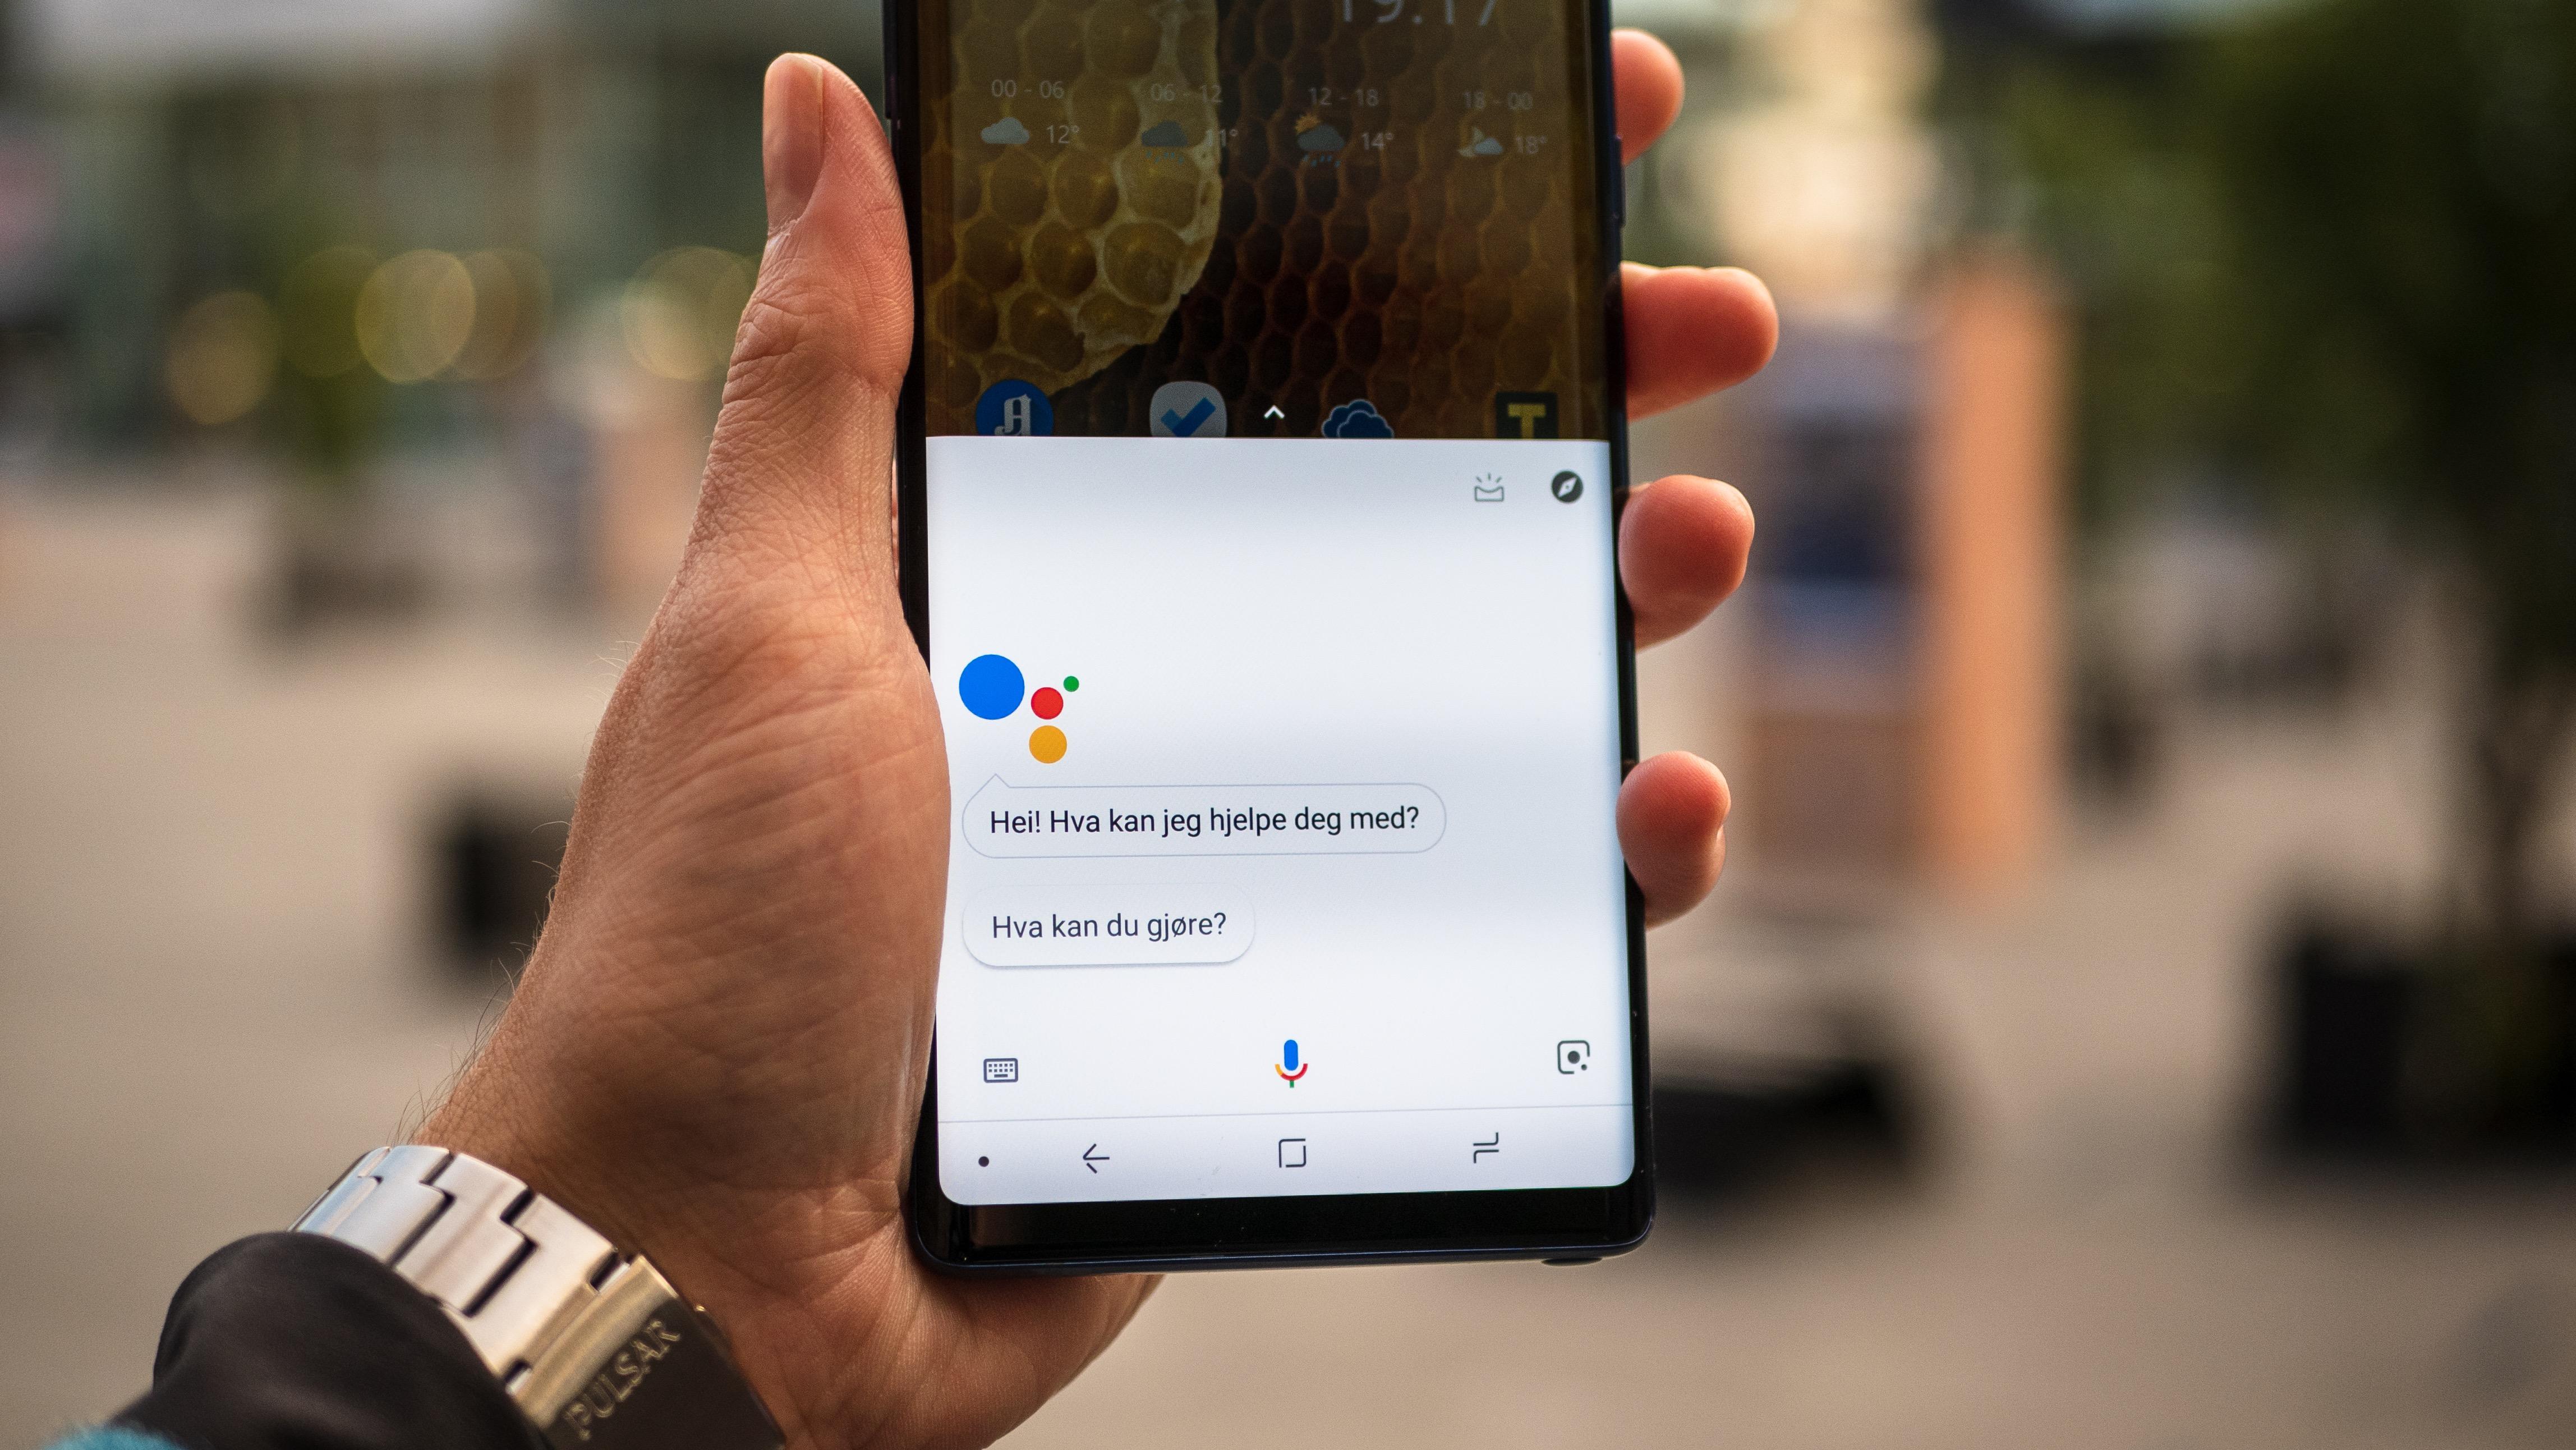 Nå snakker Google Assistant norsk.